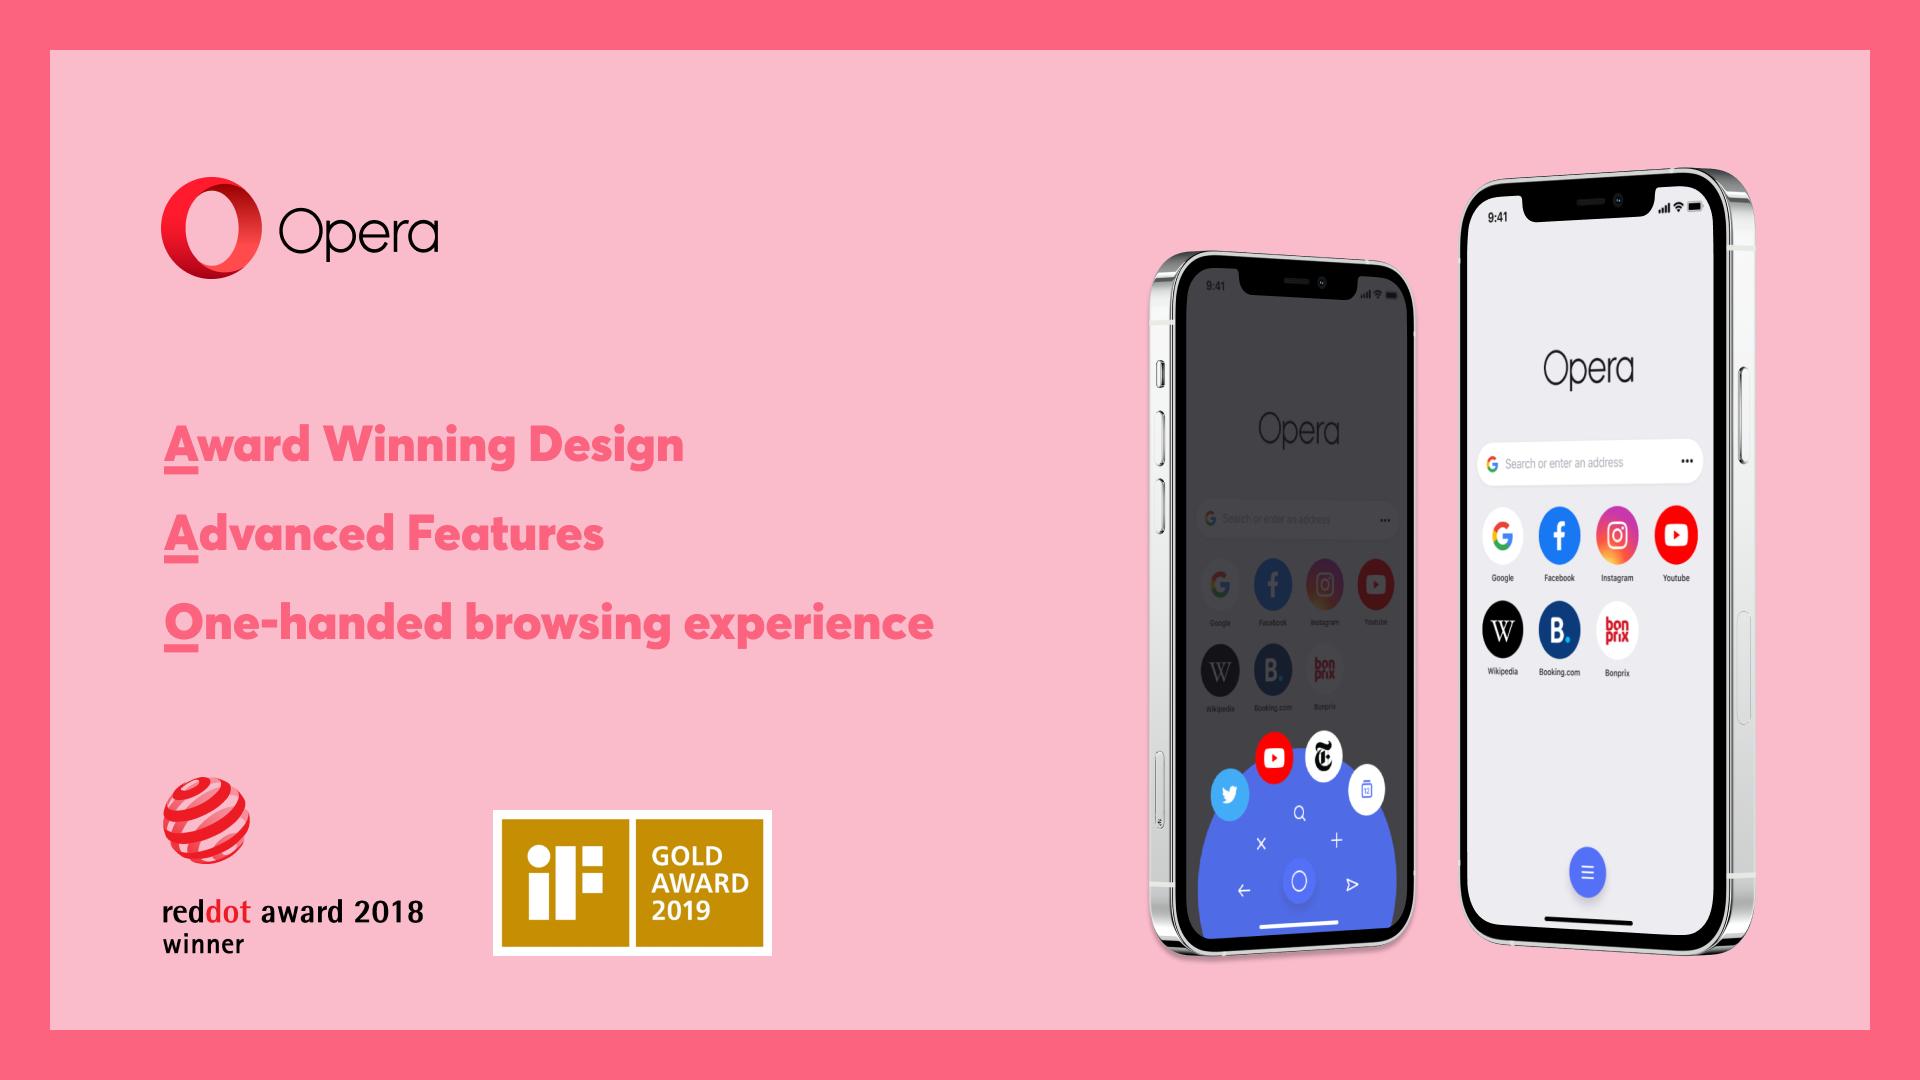 opera ios update one handed design